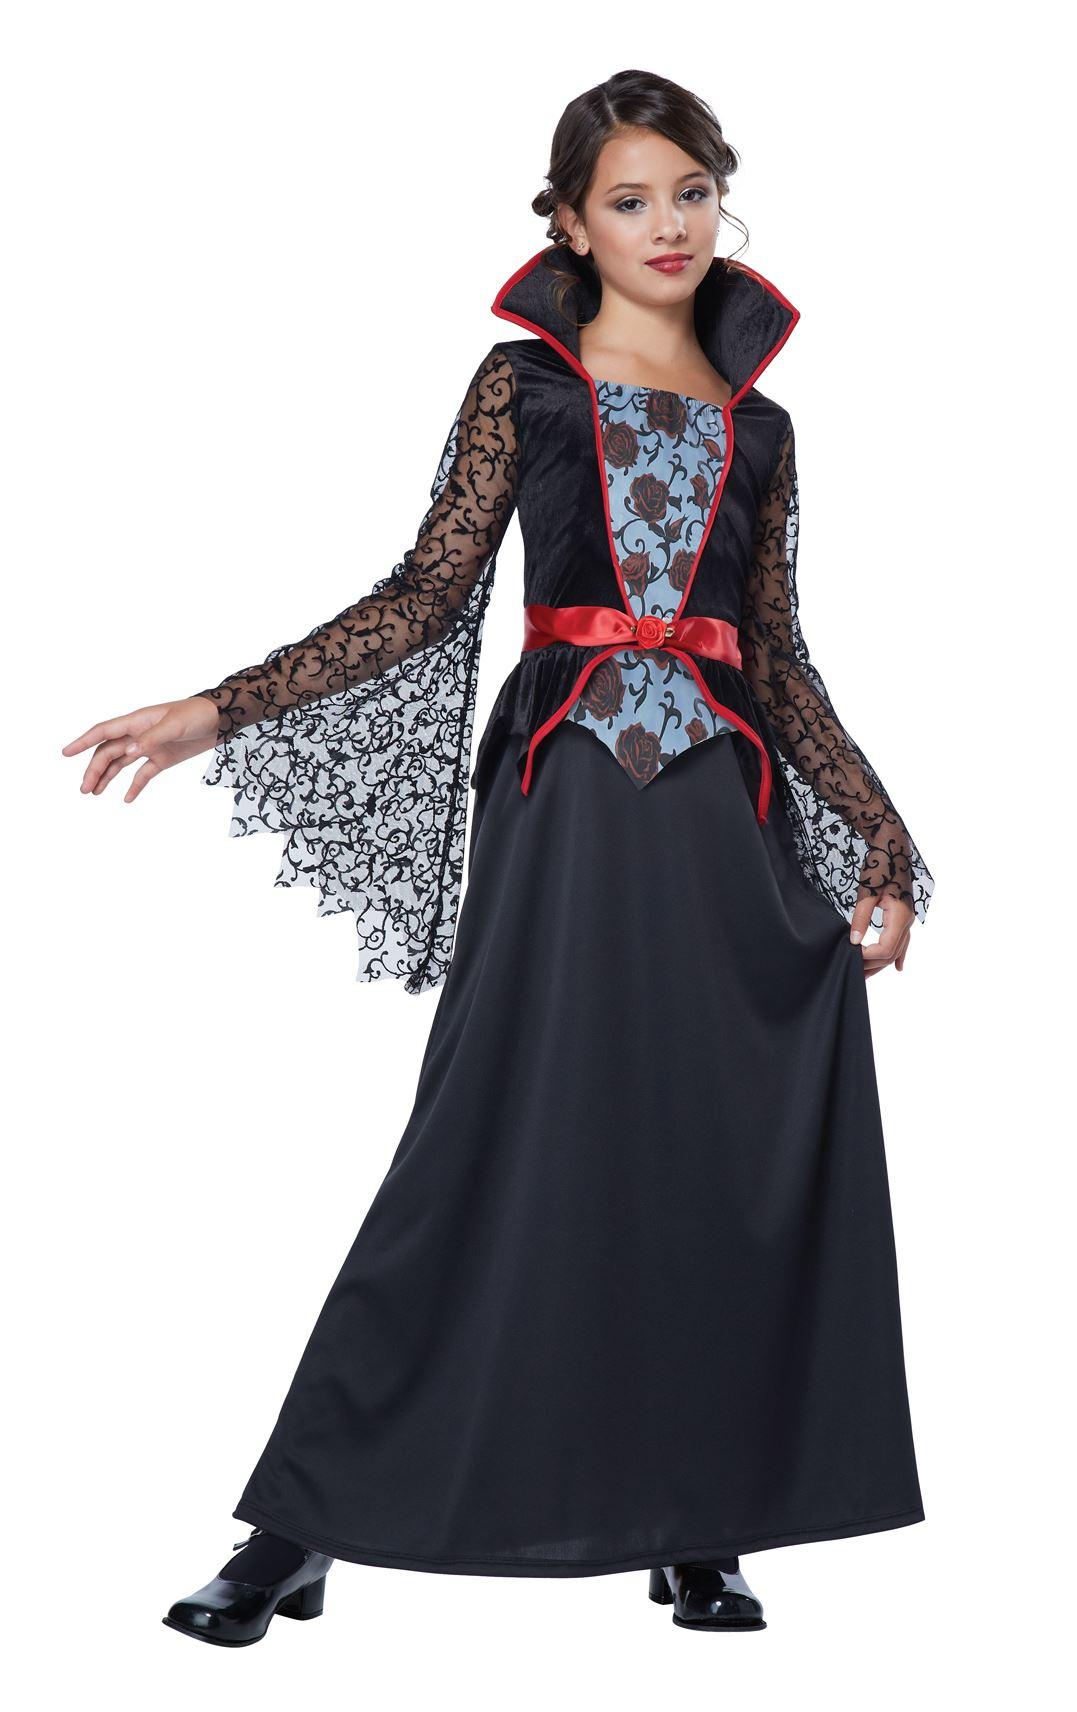 Adult Countess Bloodthorne Girls Vampire Costume | $19.99 ...